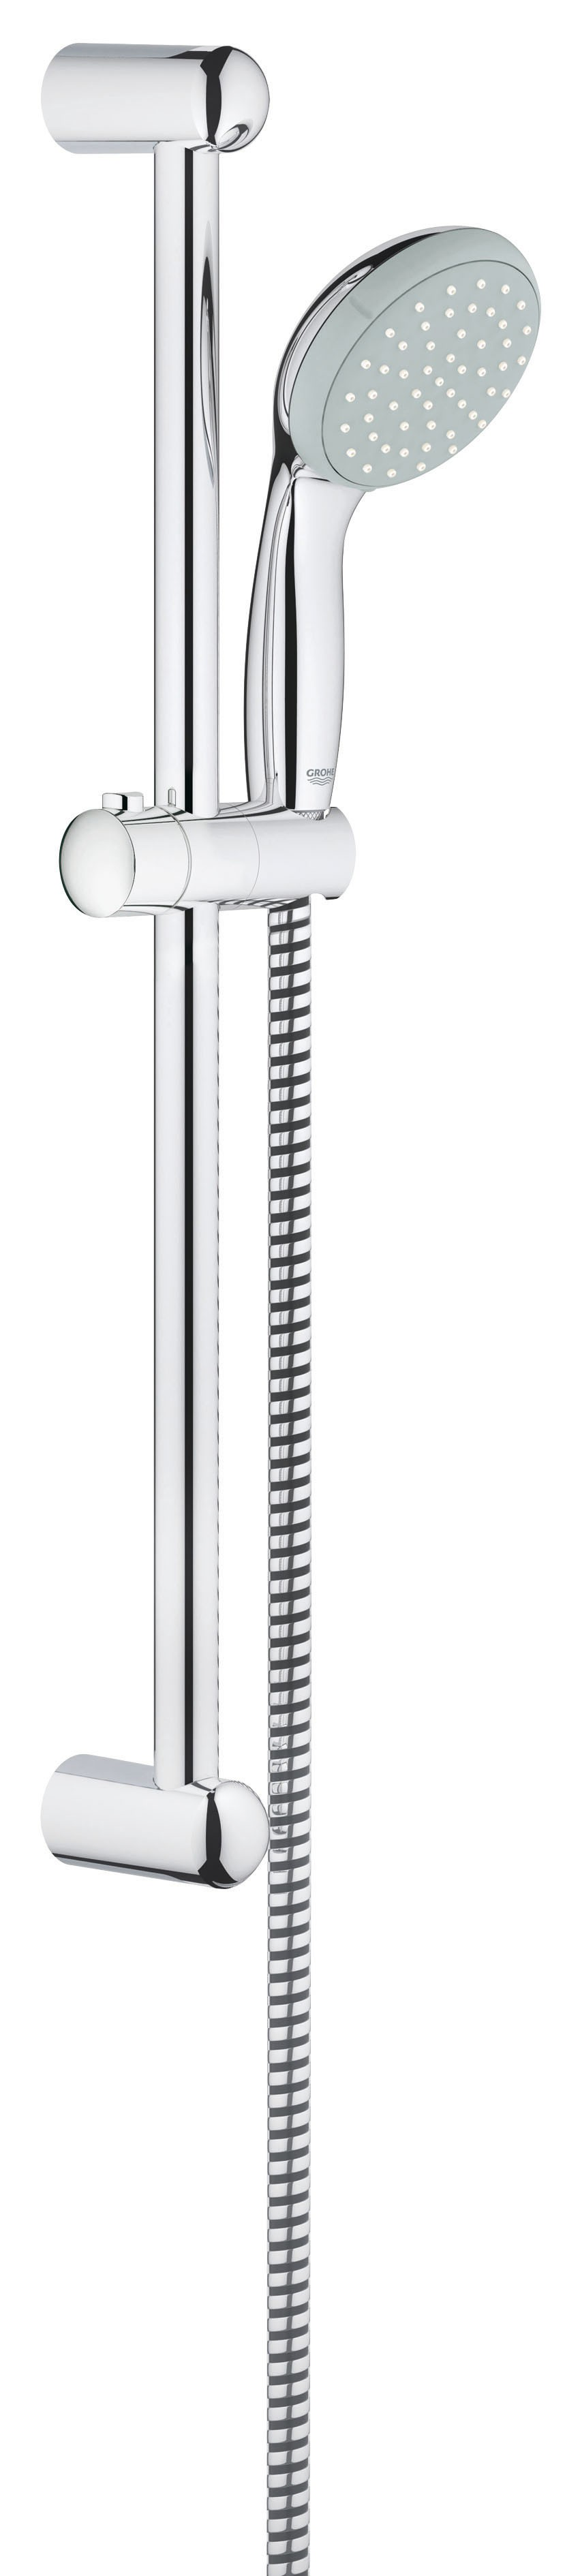 Grohe 27853000 Tempesta Classic (ручной душ, штанга 600 мм, шланг 1750 мм), хром (27853000)